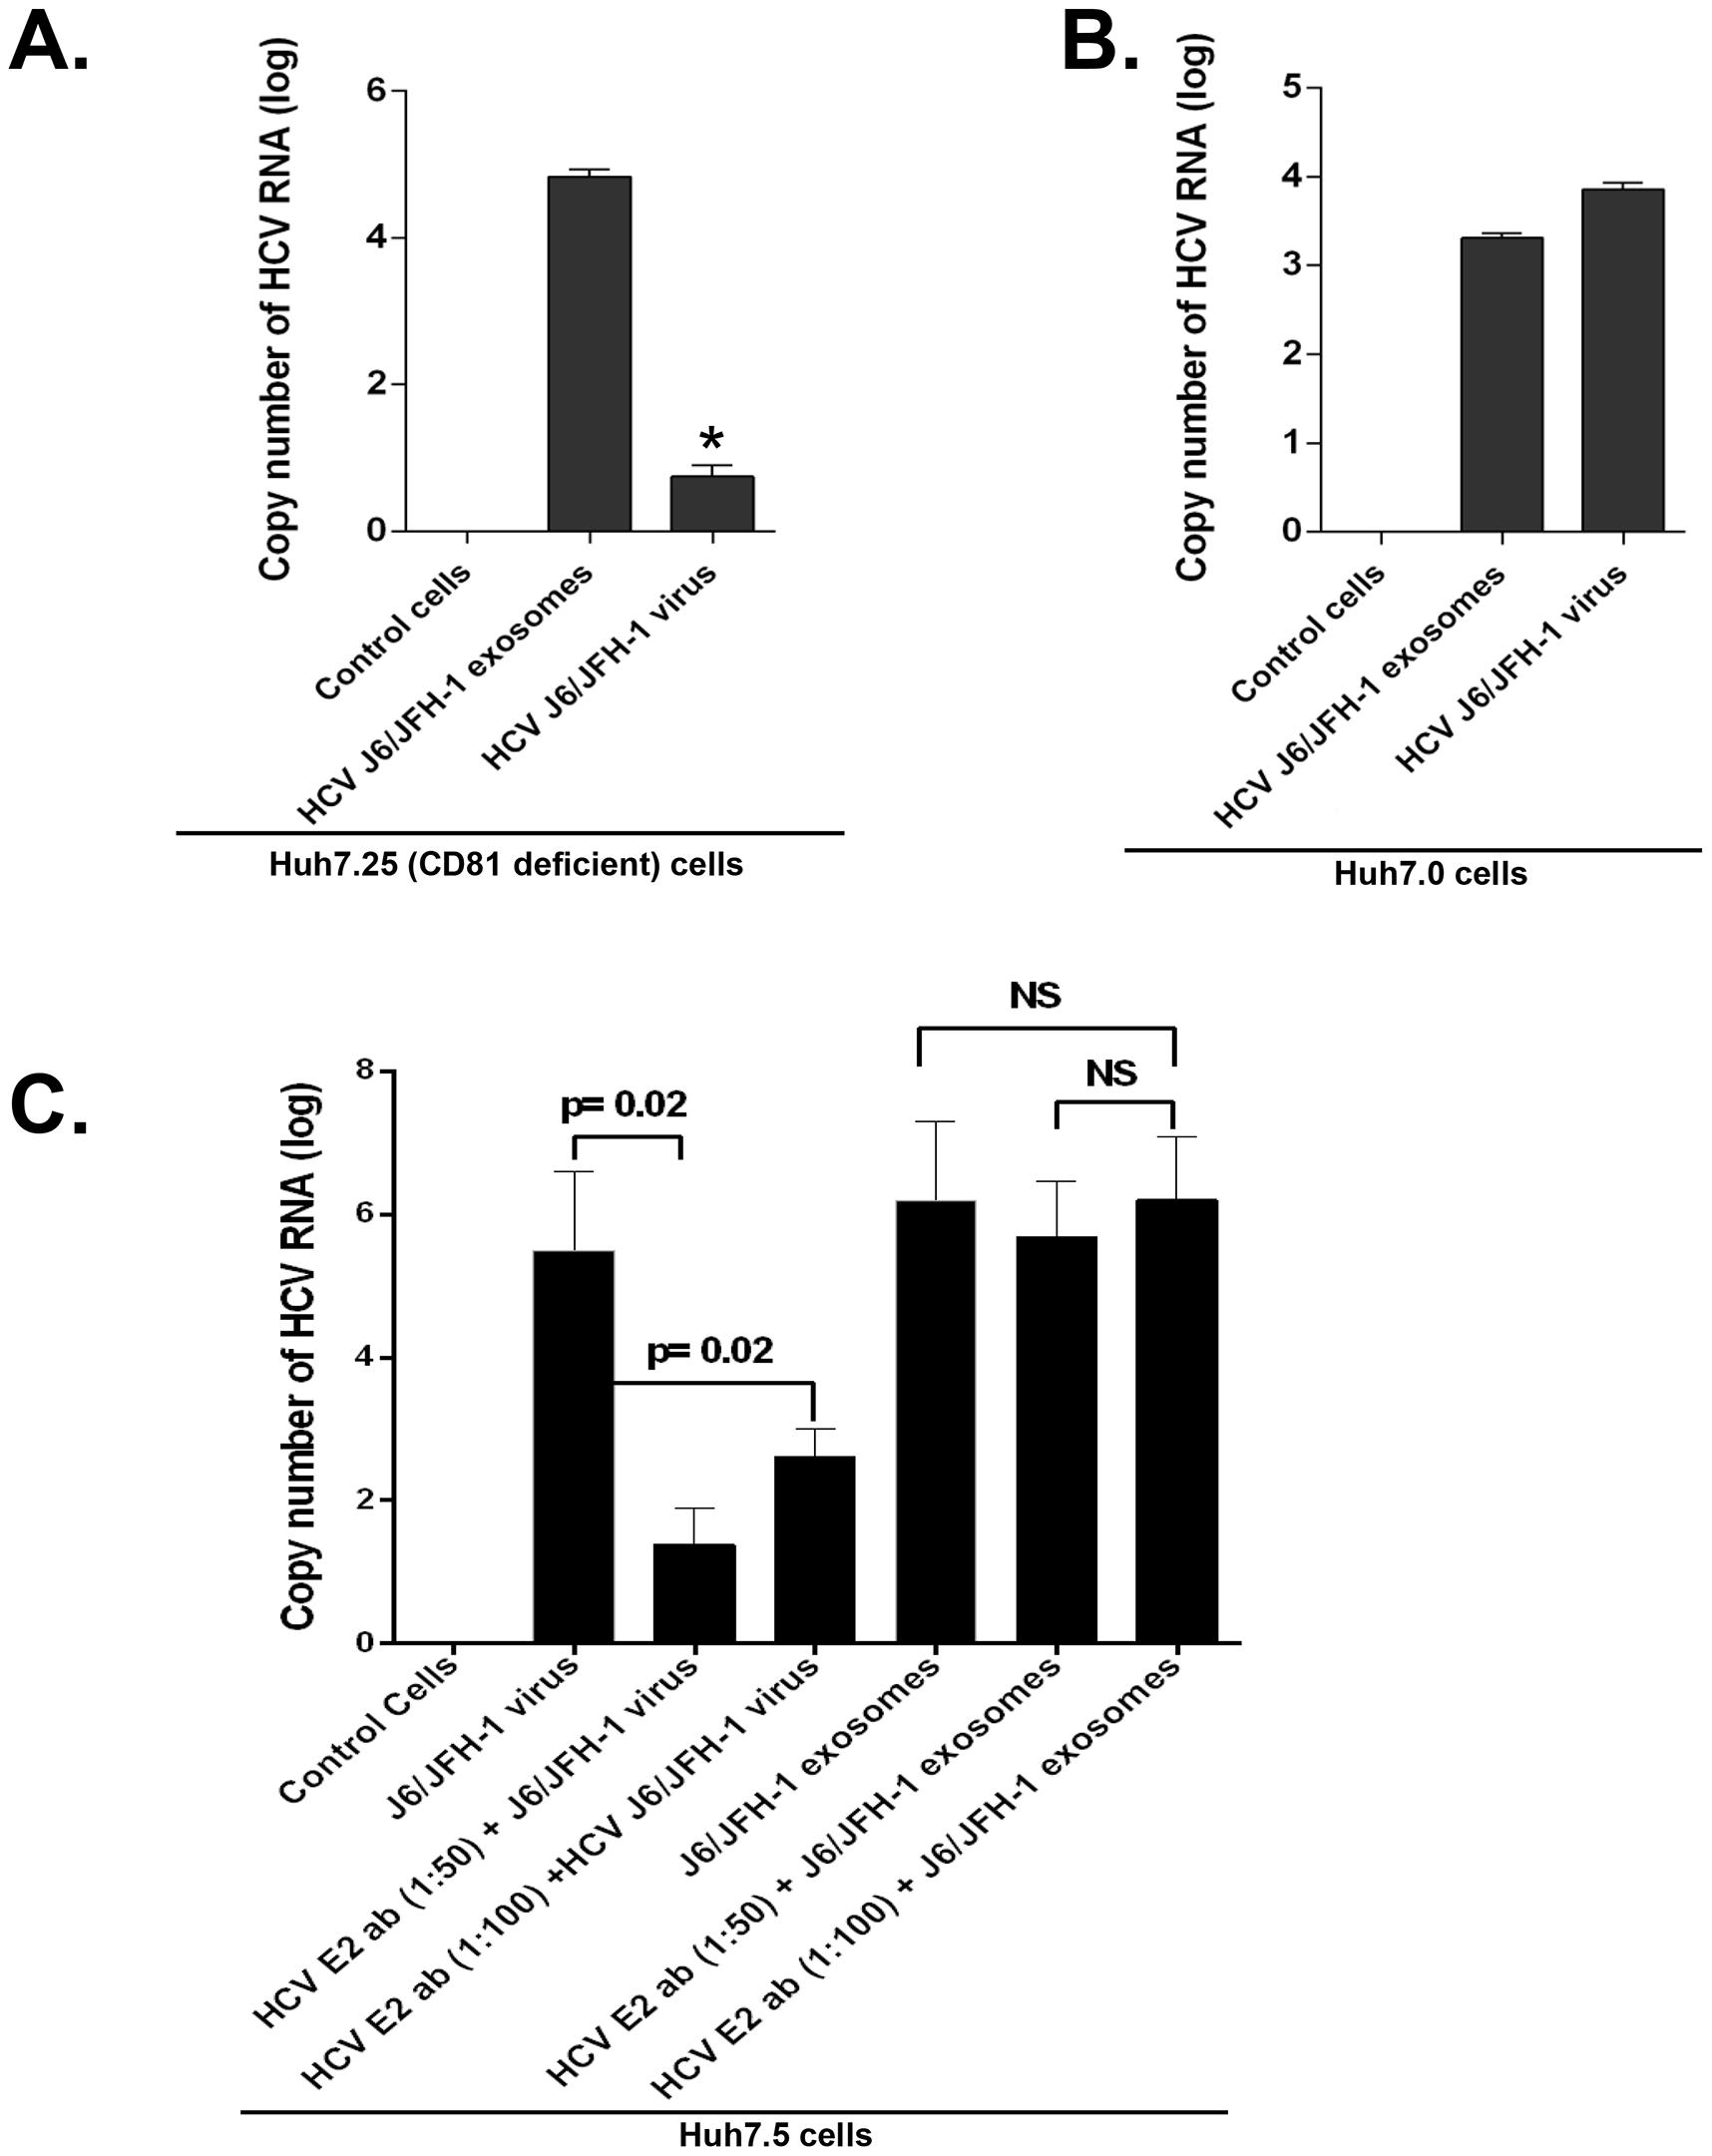 CD81 deficiency or anti-HCV E2 antibody treatment does not block effective HCV transmission by exosomes.